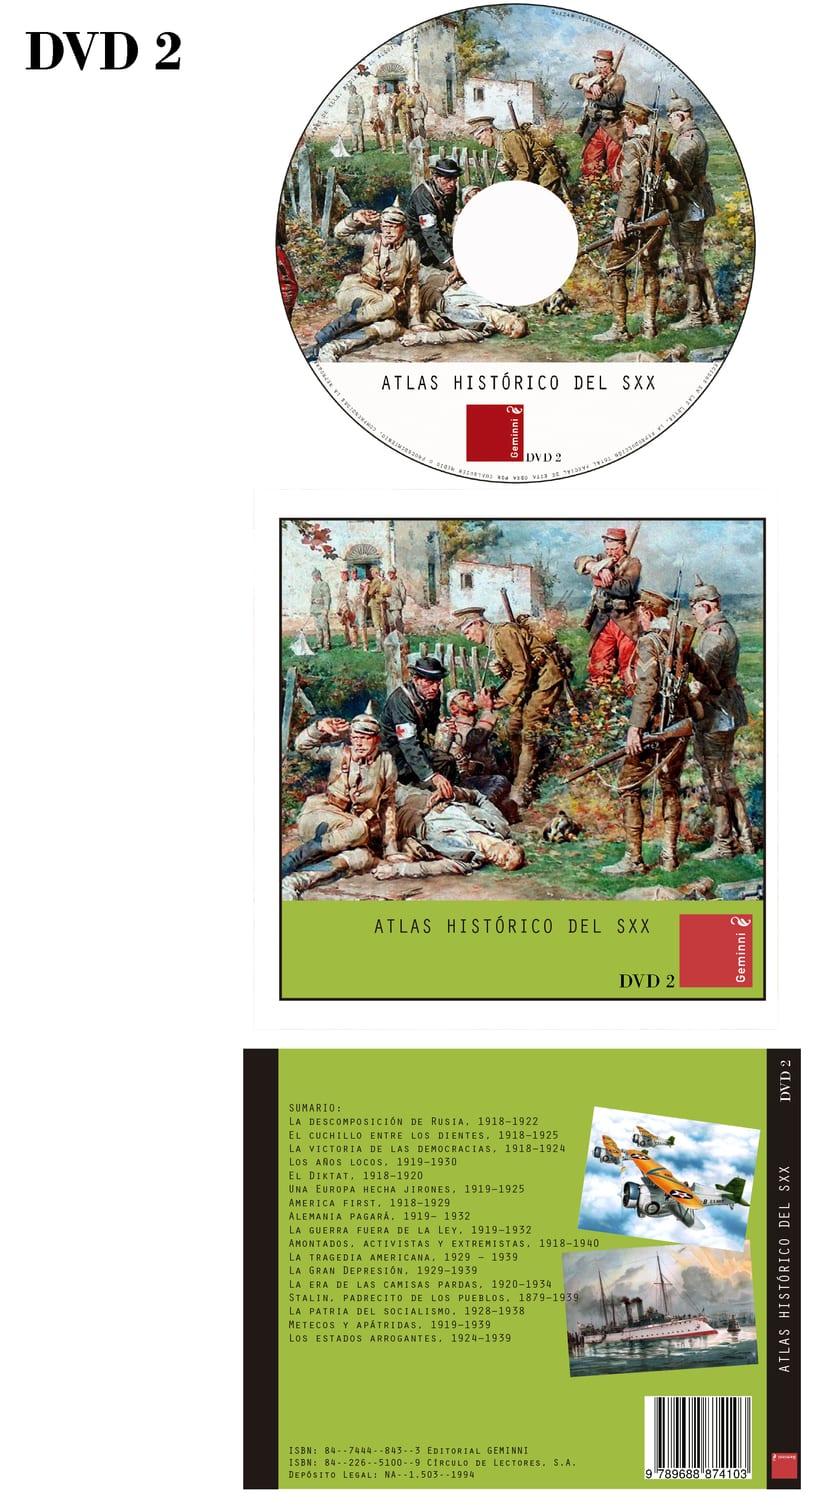 Atlas Histórico del Siglo XX 2